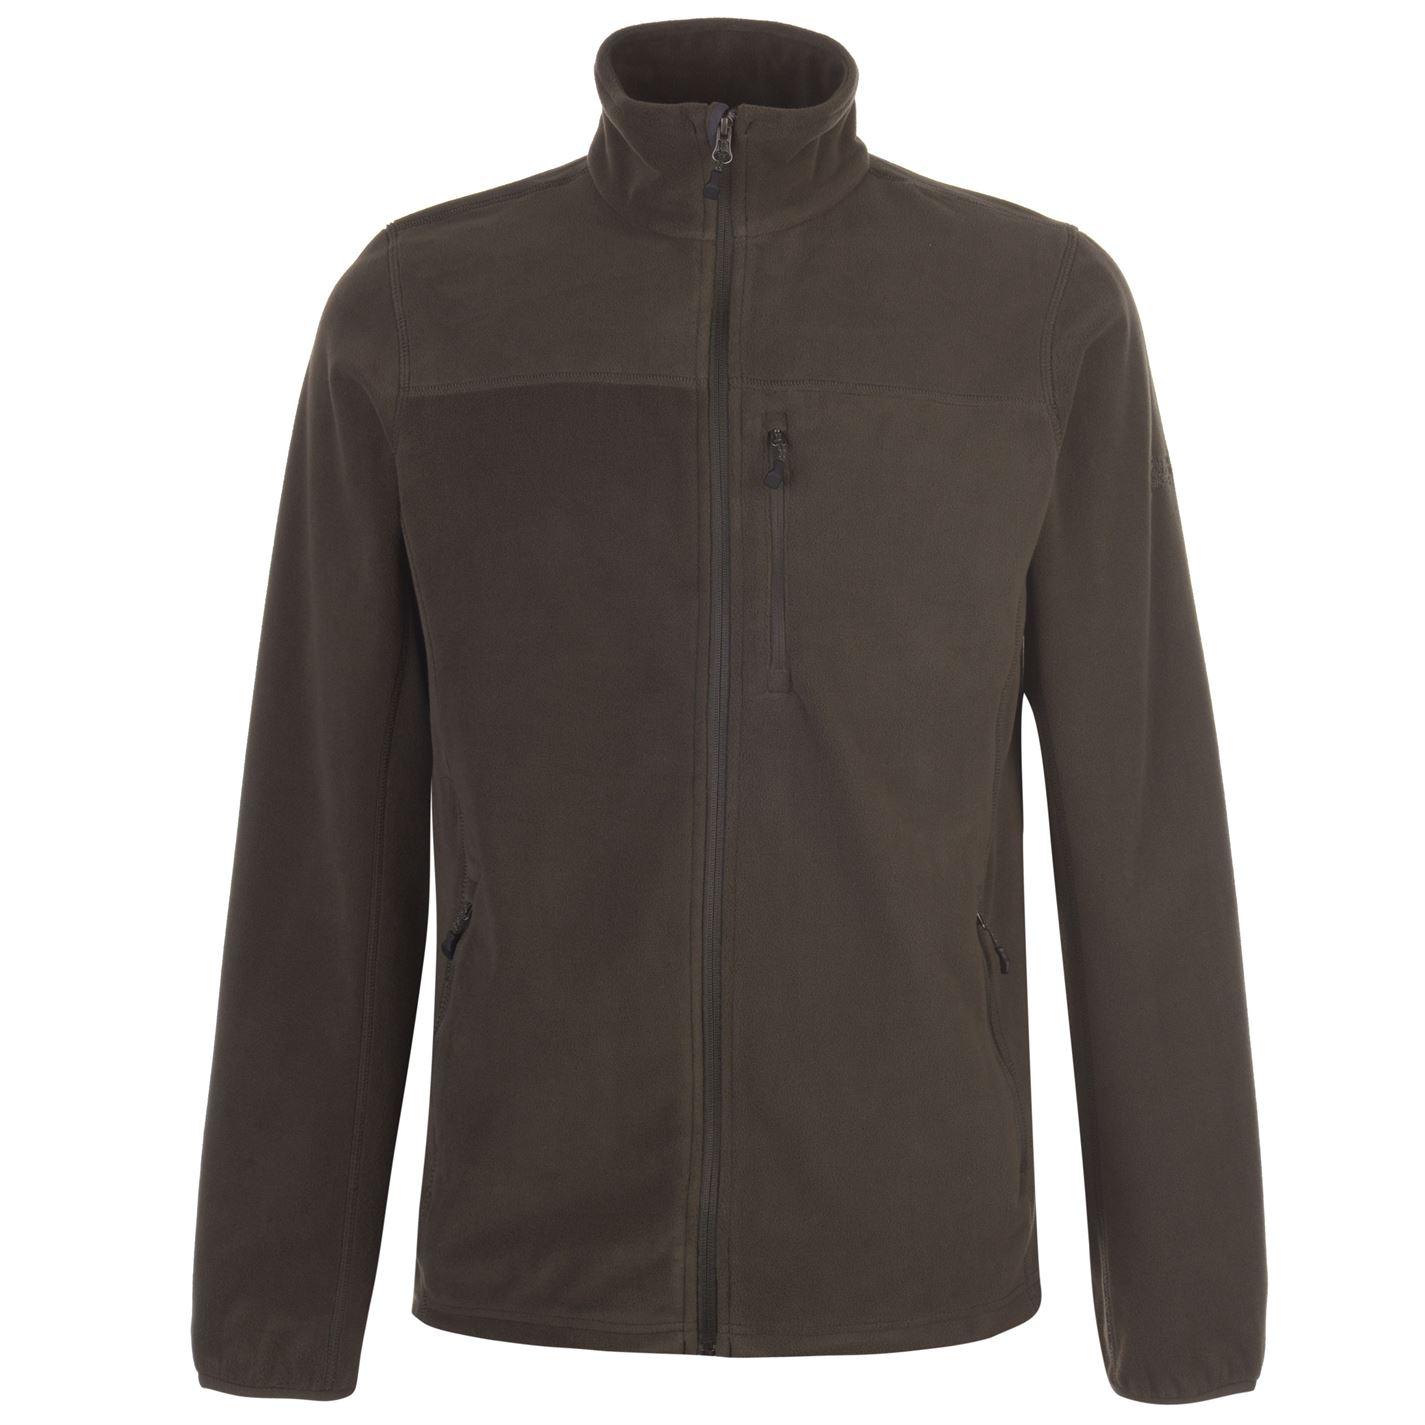 Eastern Mountain Sports Classic Fleece Jacket Mens